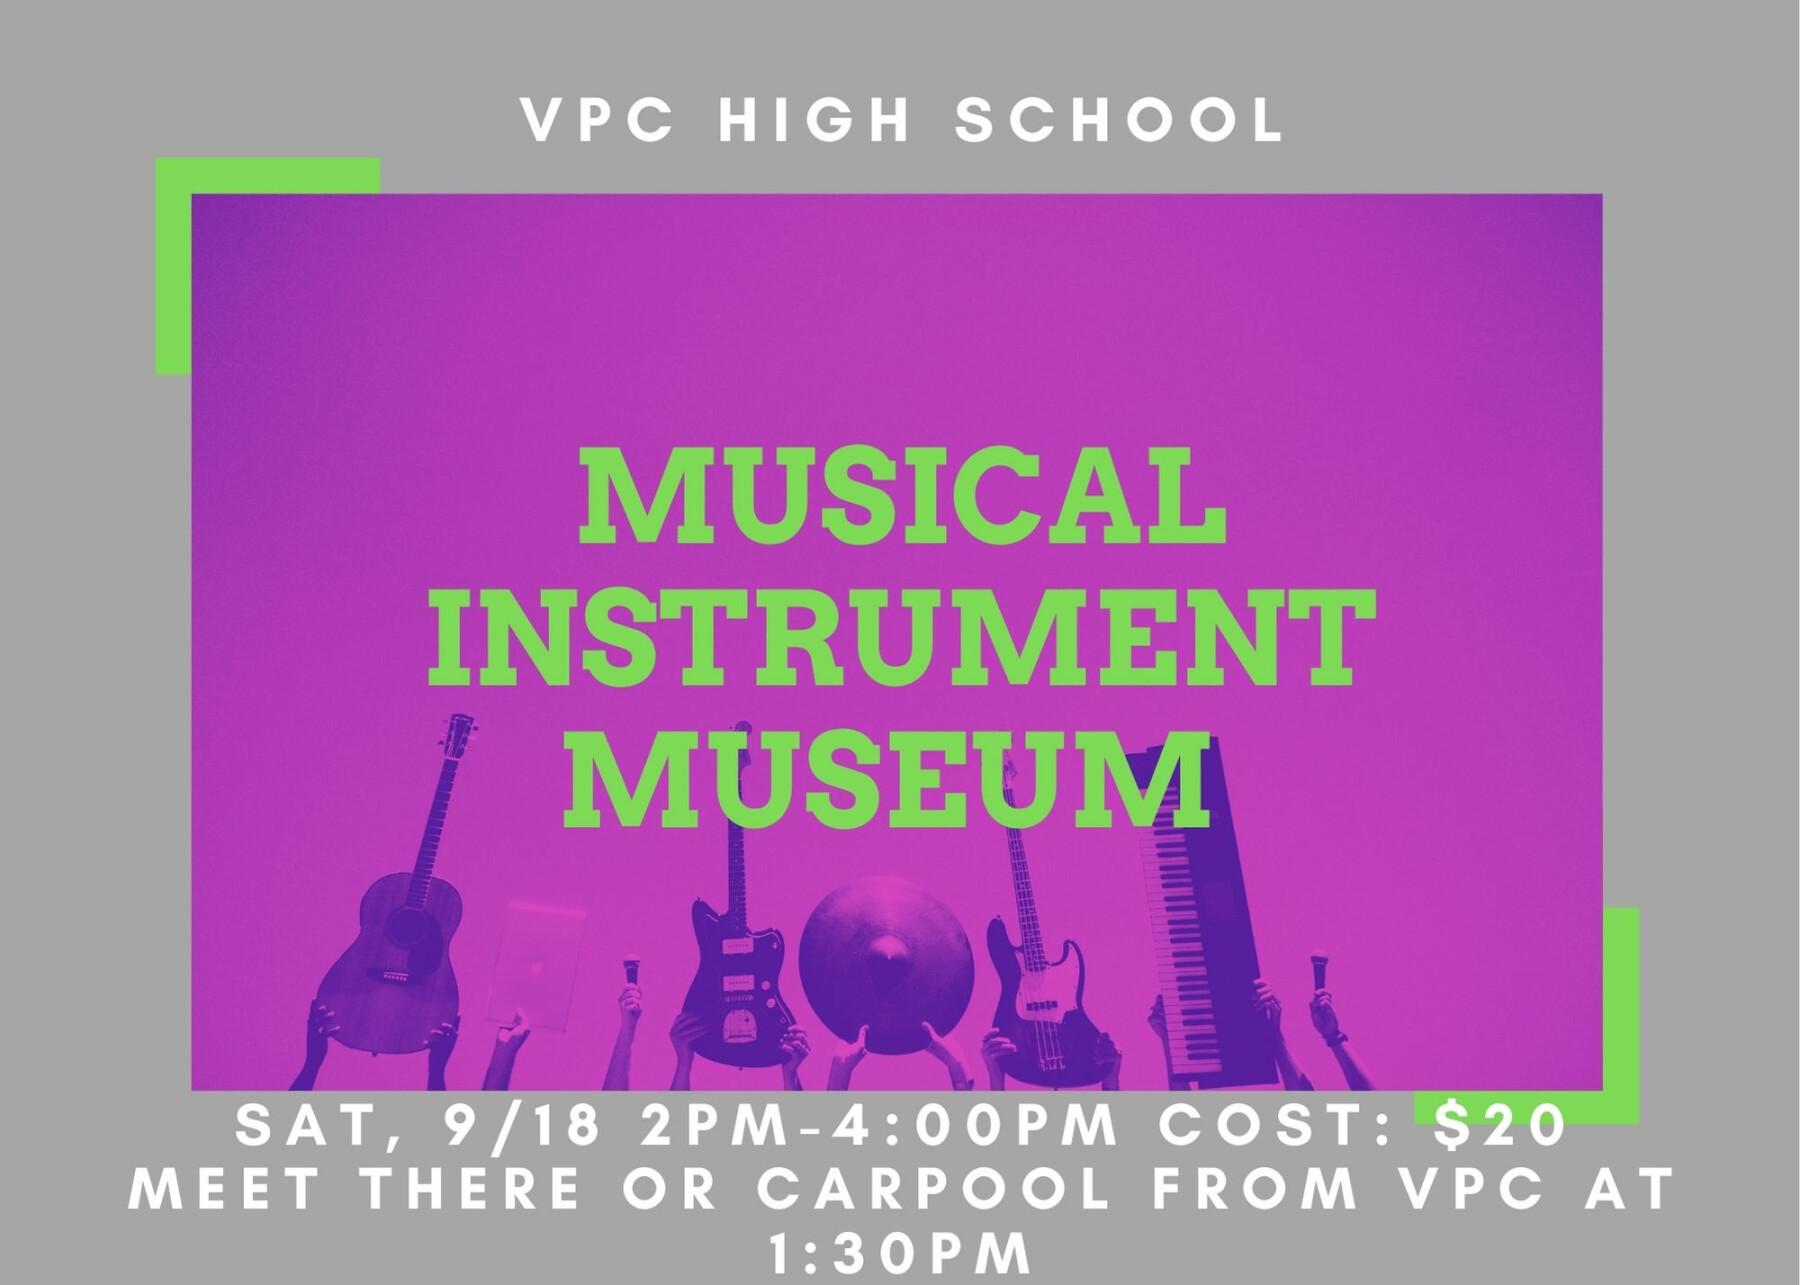 VPC High School: Musical Instrument Museum